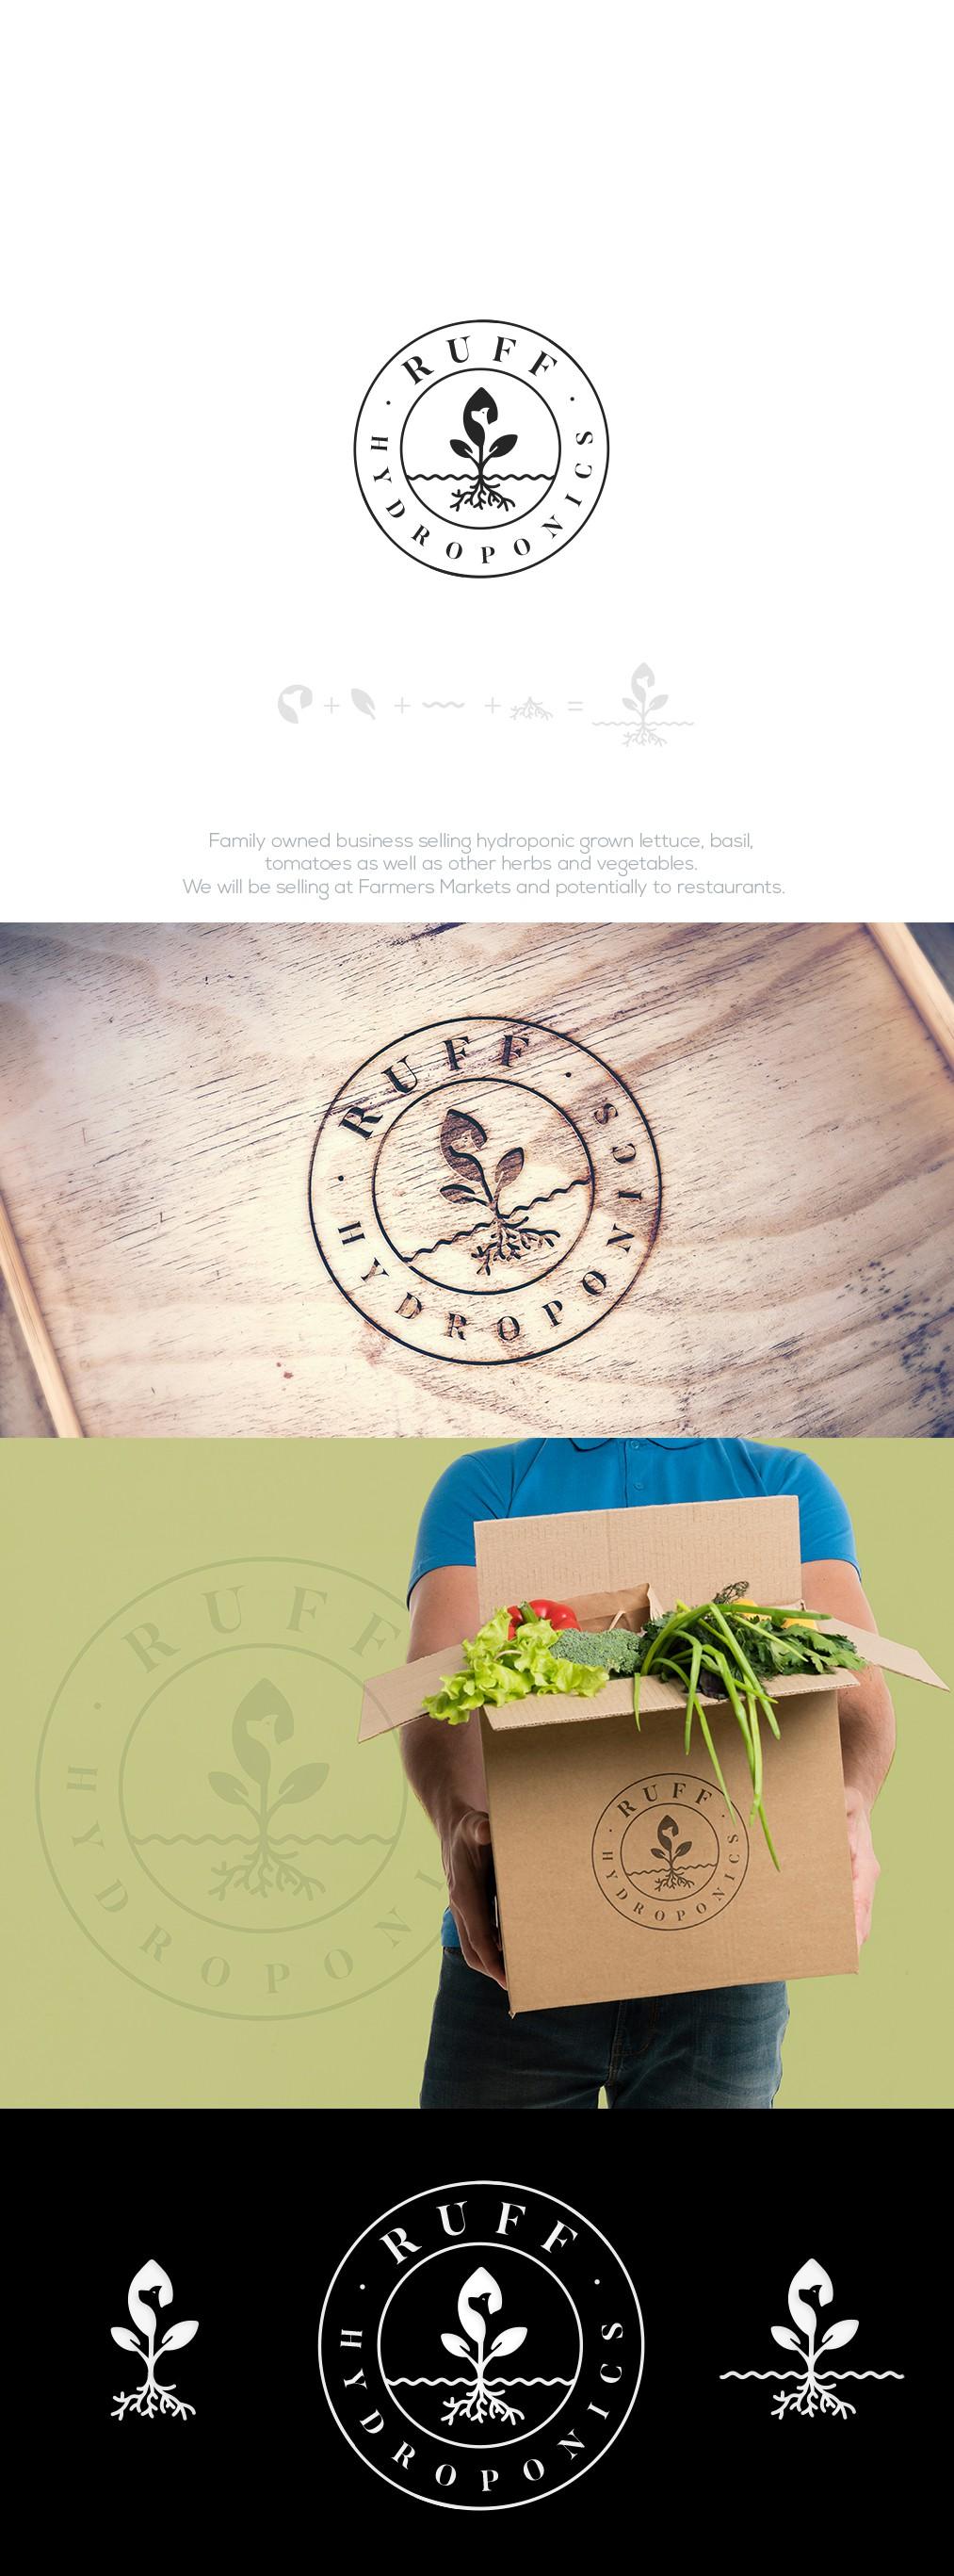 Brand new veteran owned farm, selling hydroponic veggies at Farmers markets